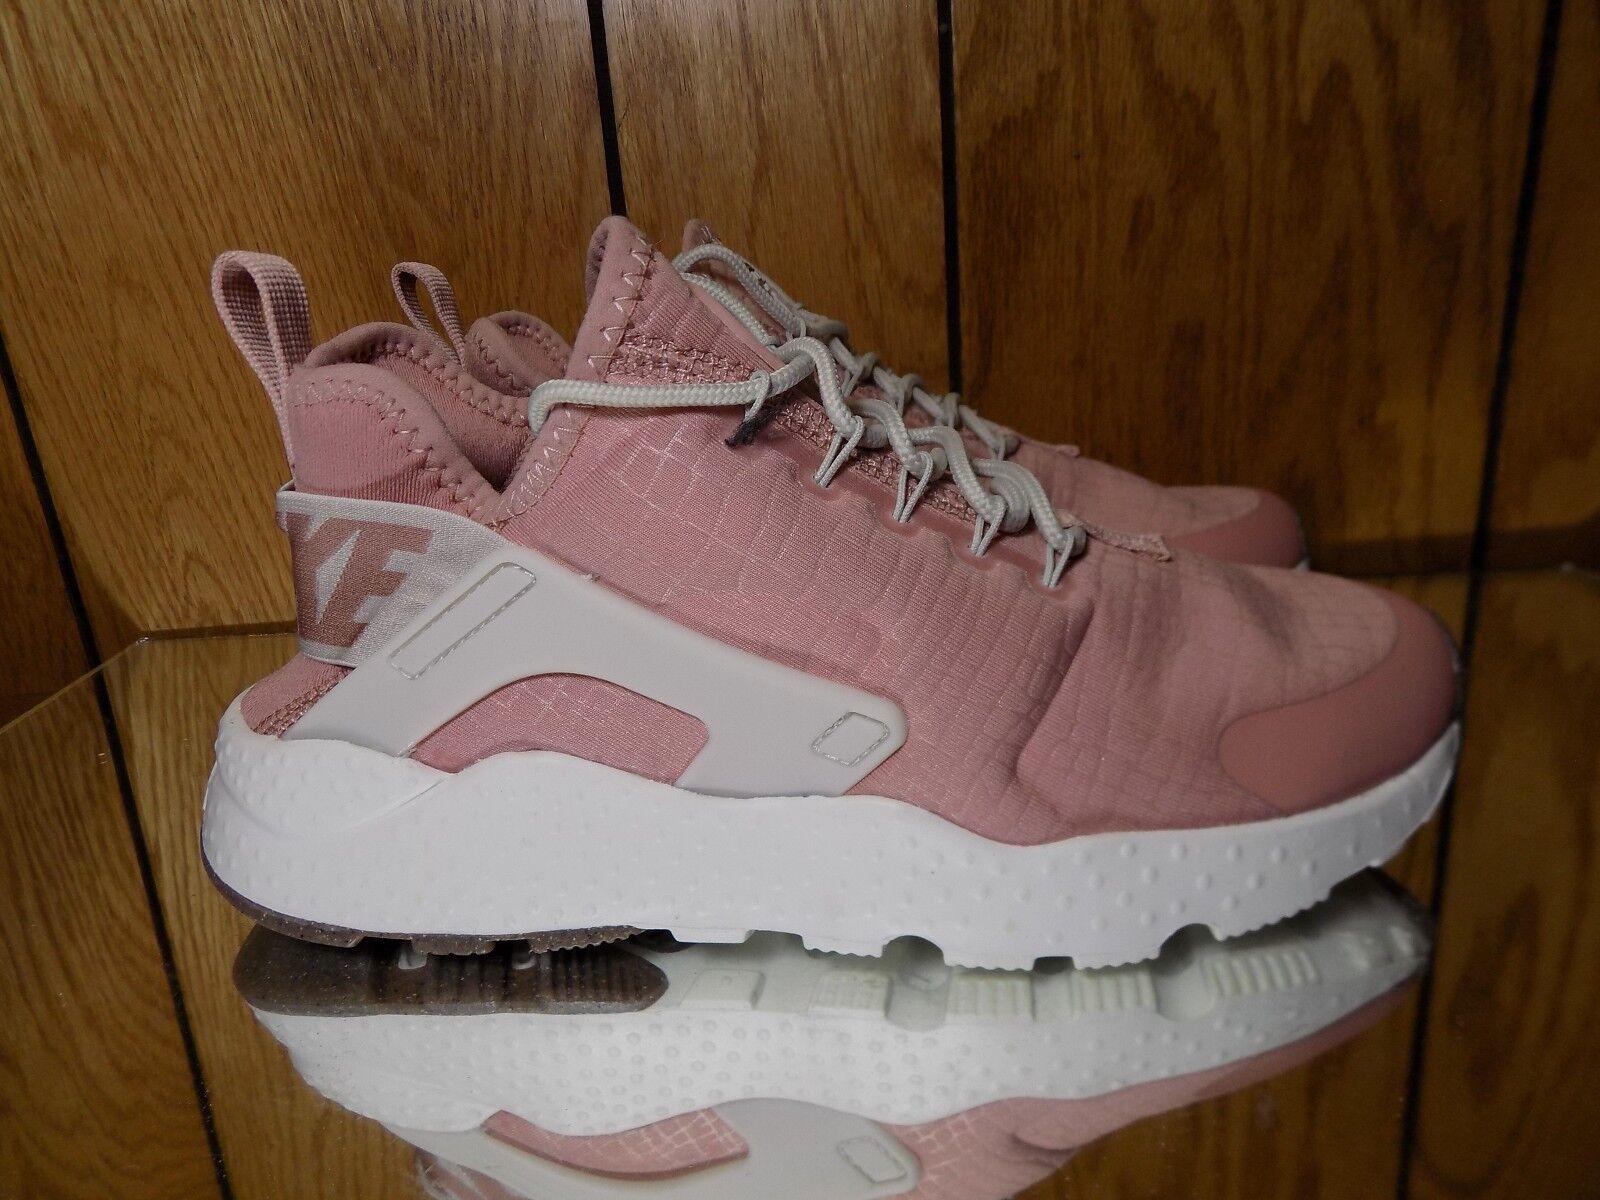 Nike Air Huarache Run Ultra Particle Pink Light Bone 819151 603 s. 6.5